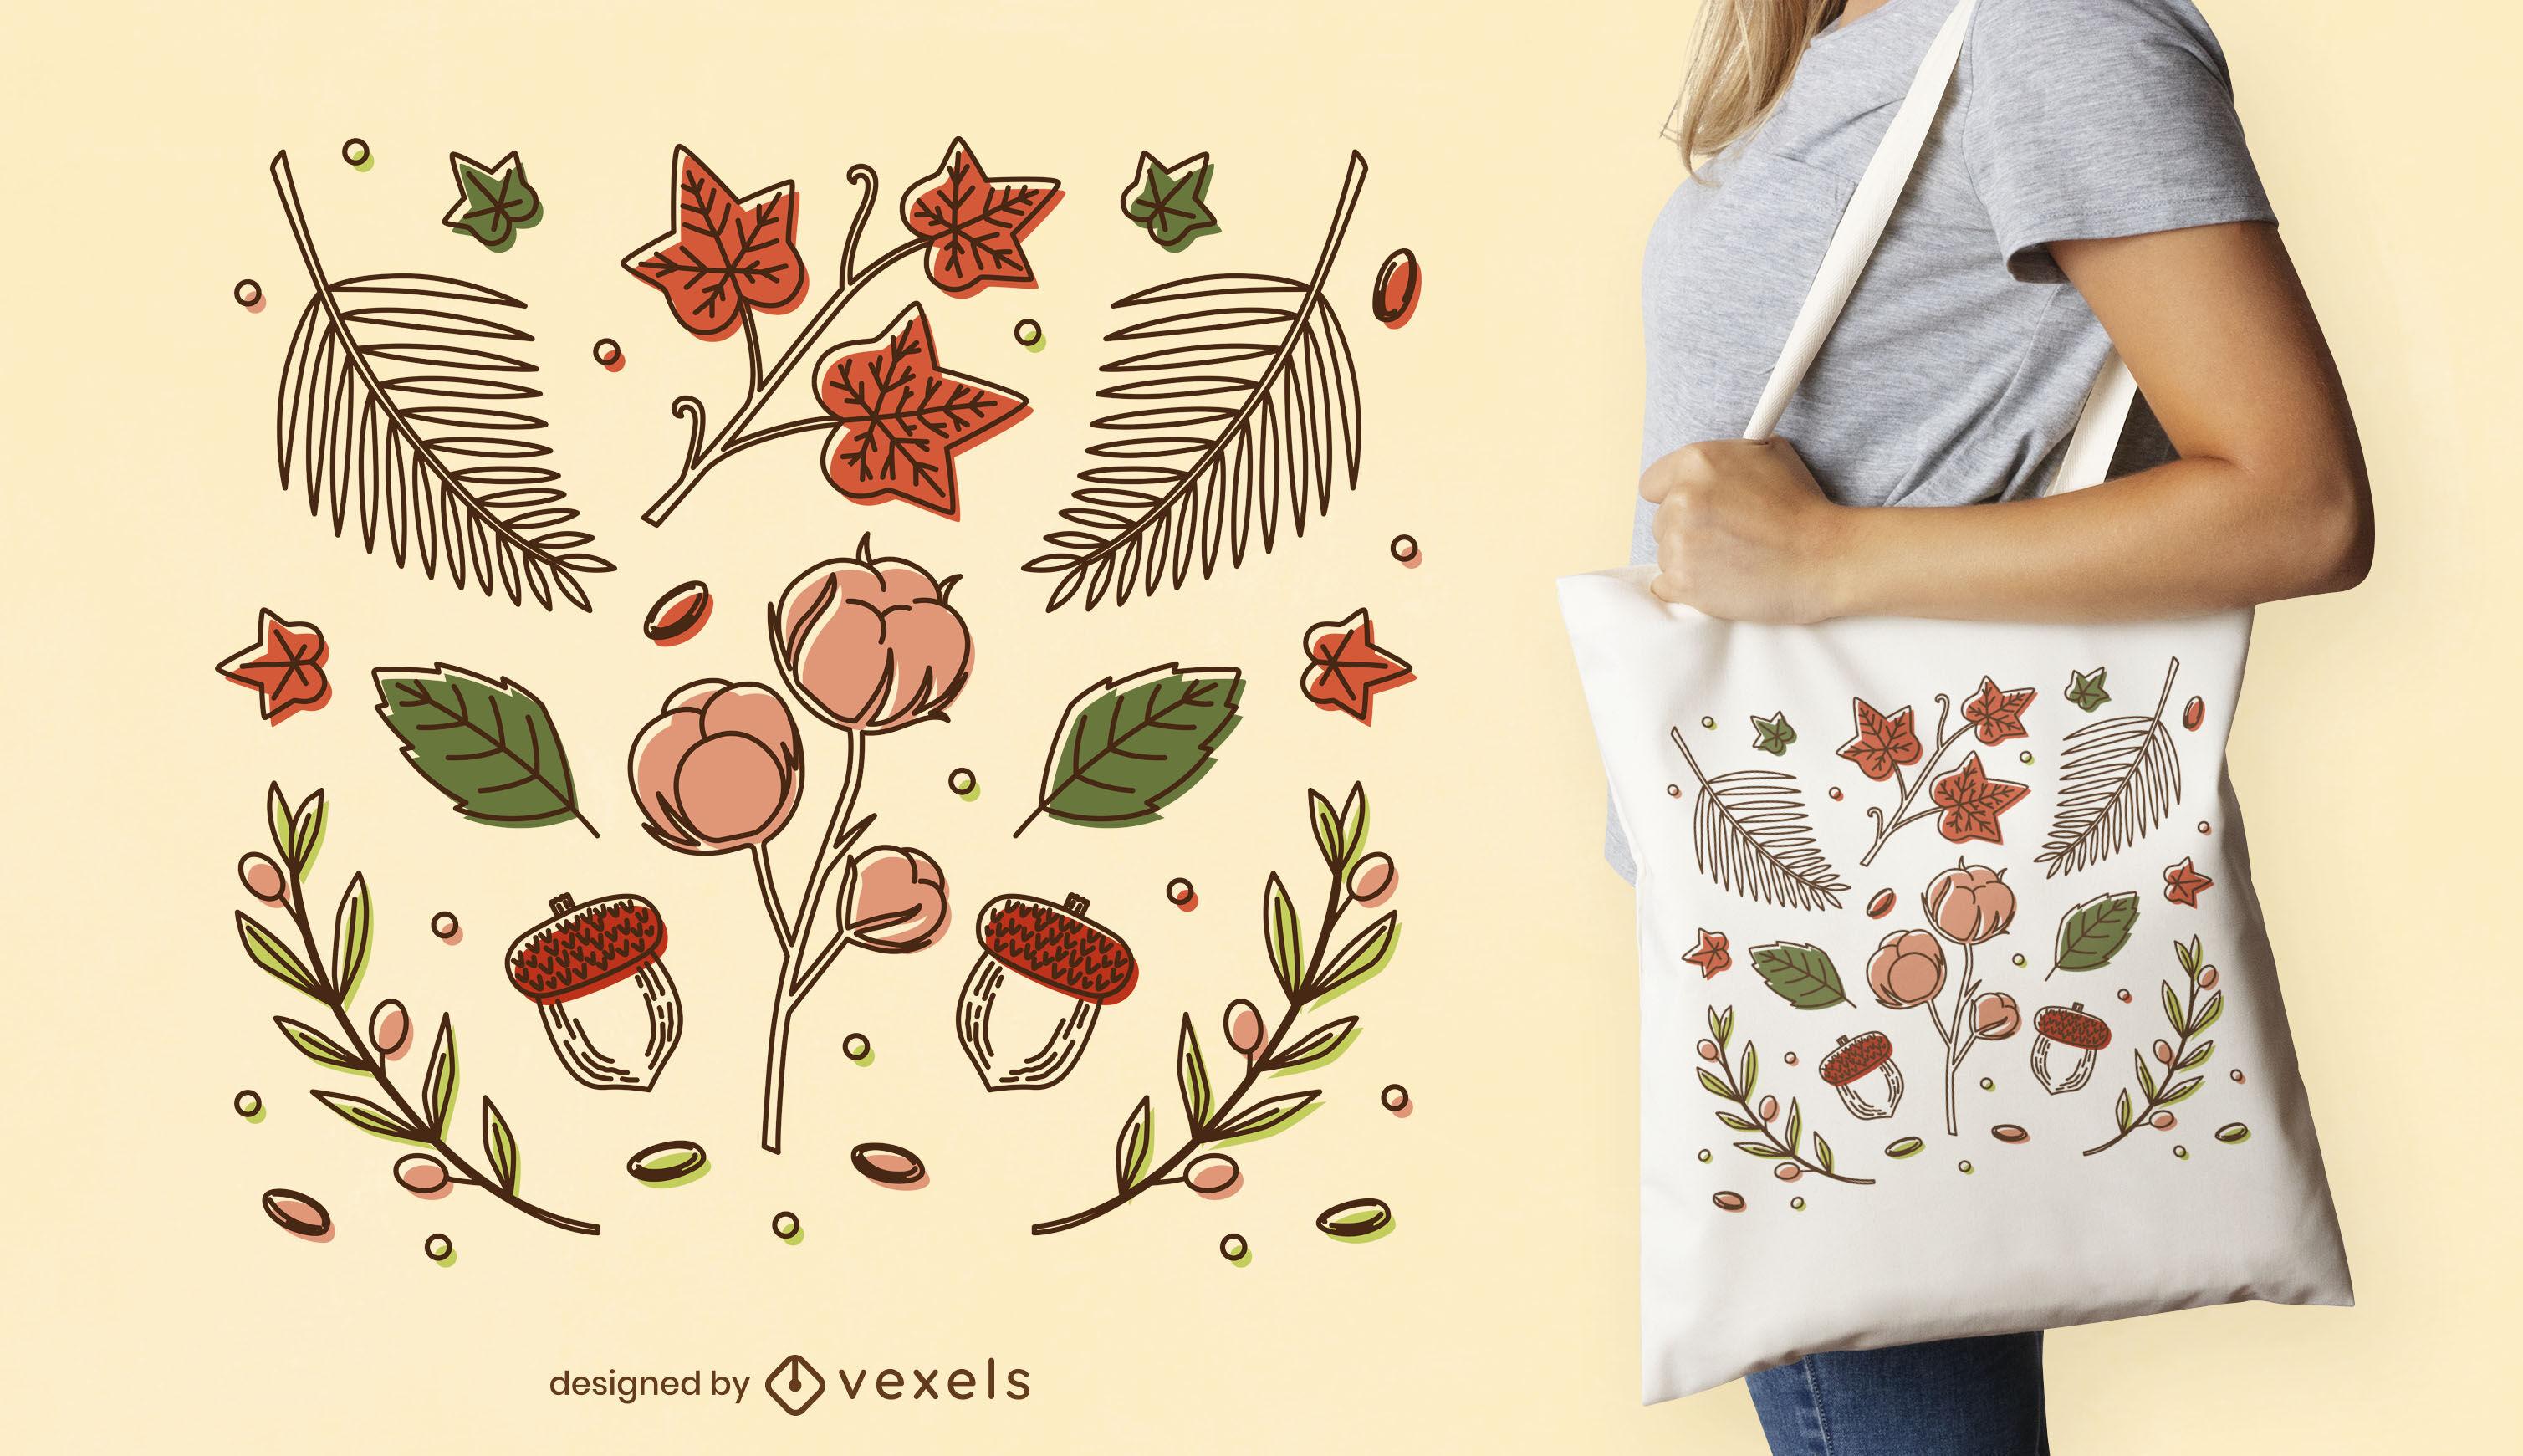 Autumn season leaves tote bag design